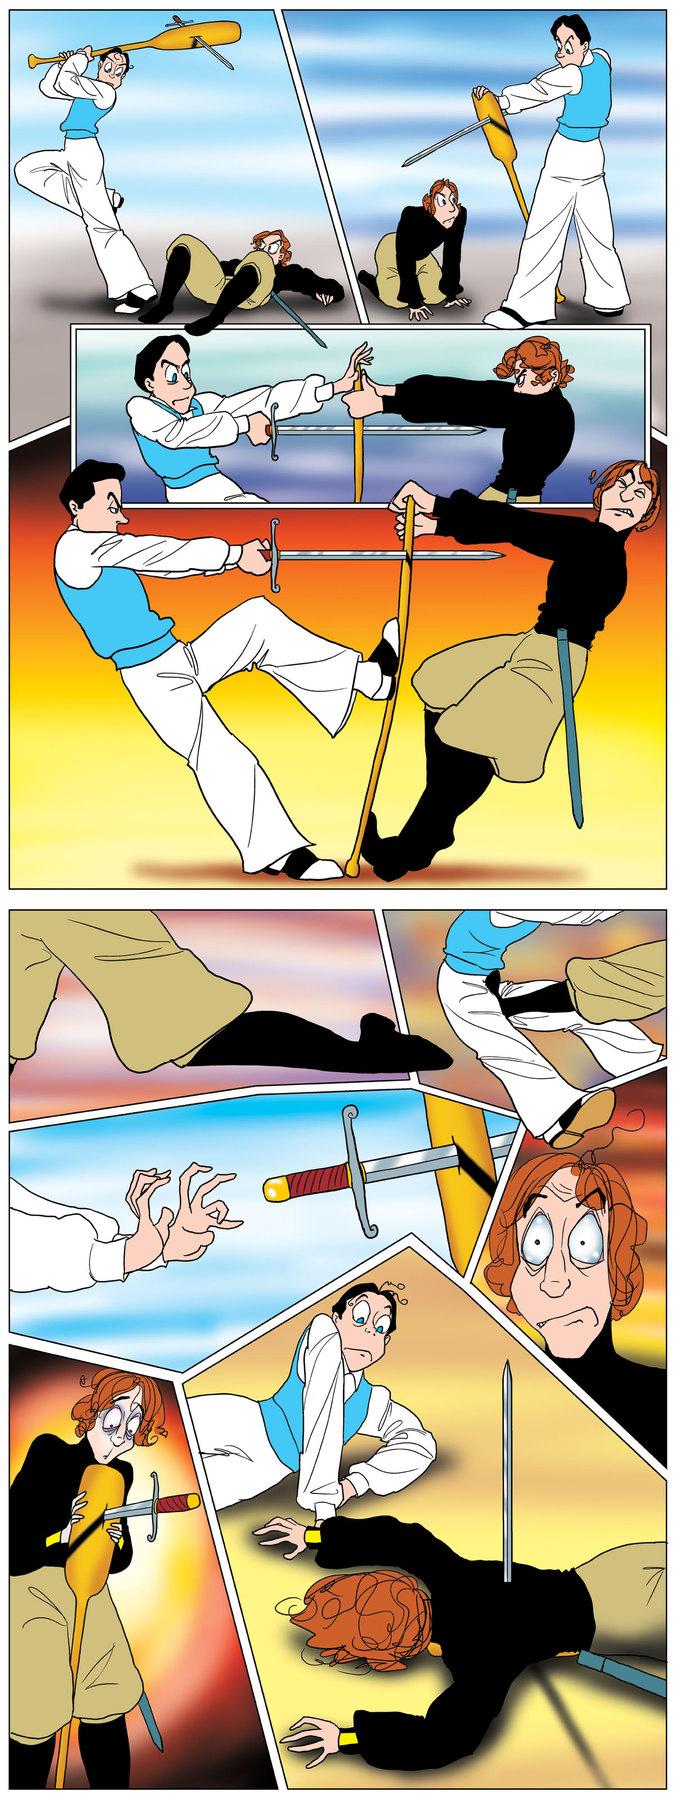 Pibgorn for Mar 4, 2014 Comic Strip